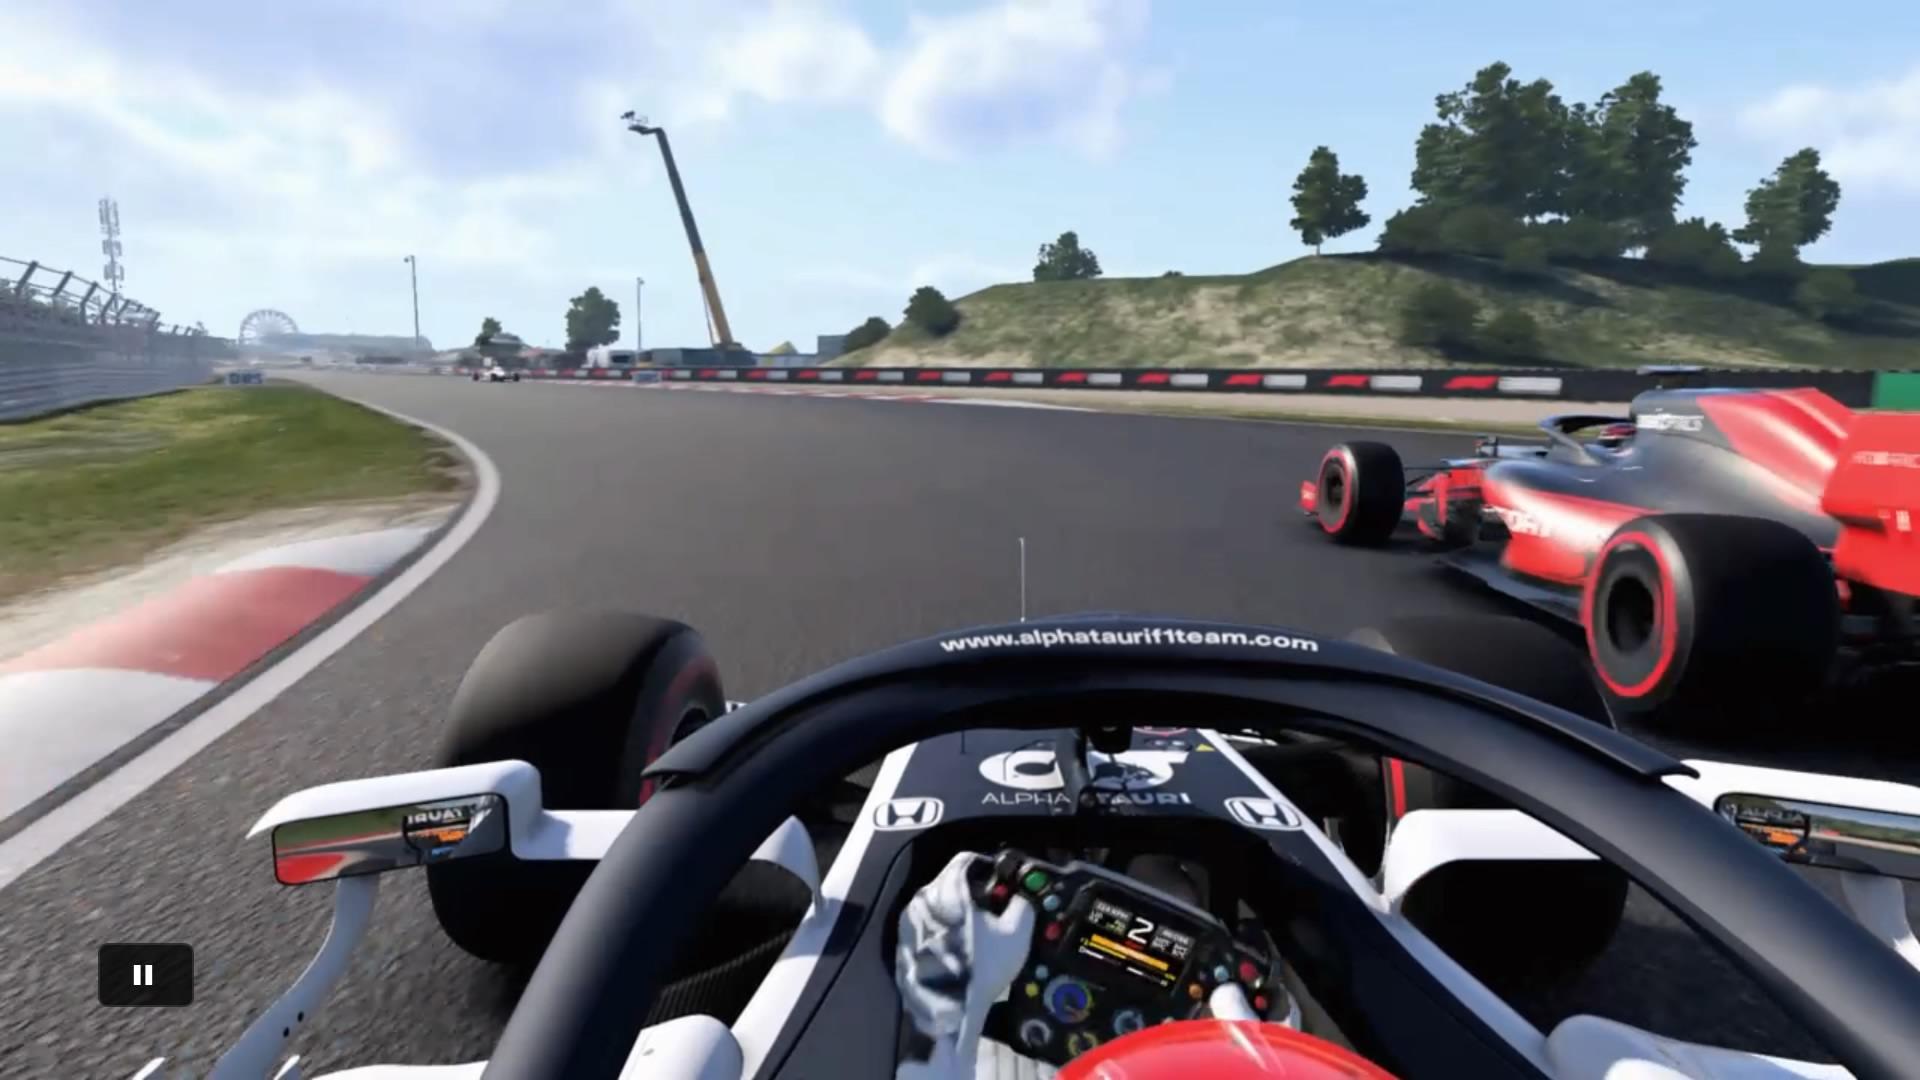 F1 2020 My Own Team Ed-KXB7-VXYAI-PSE